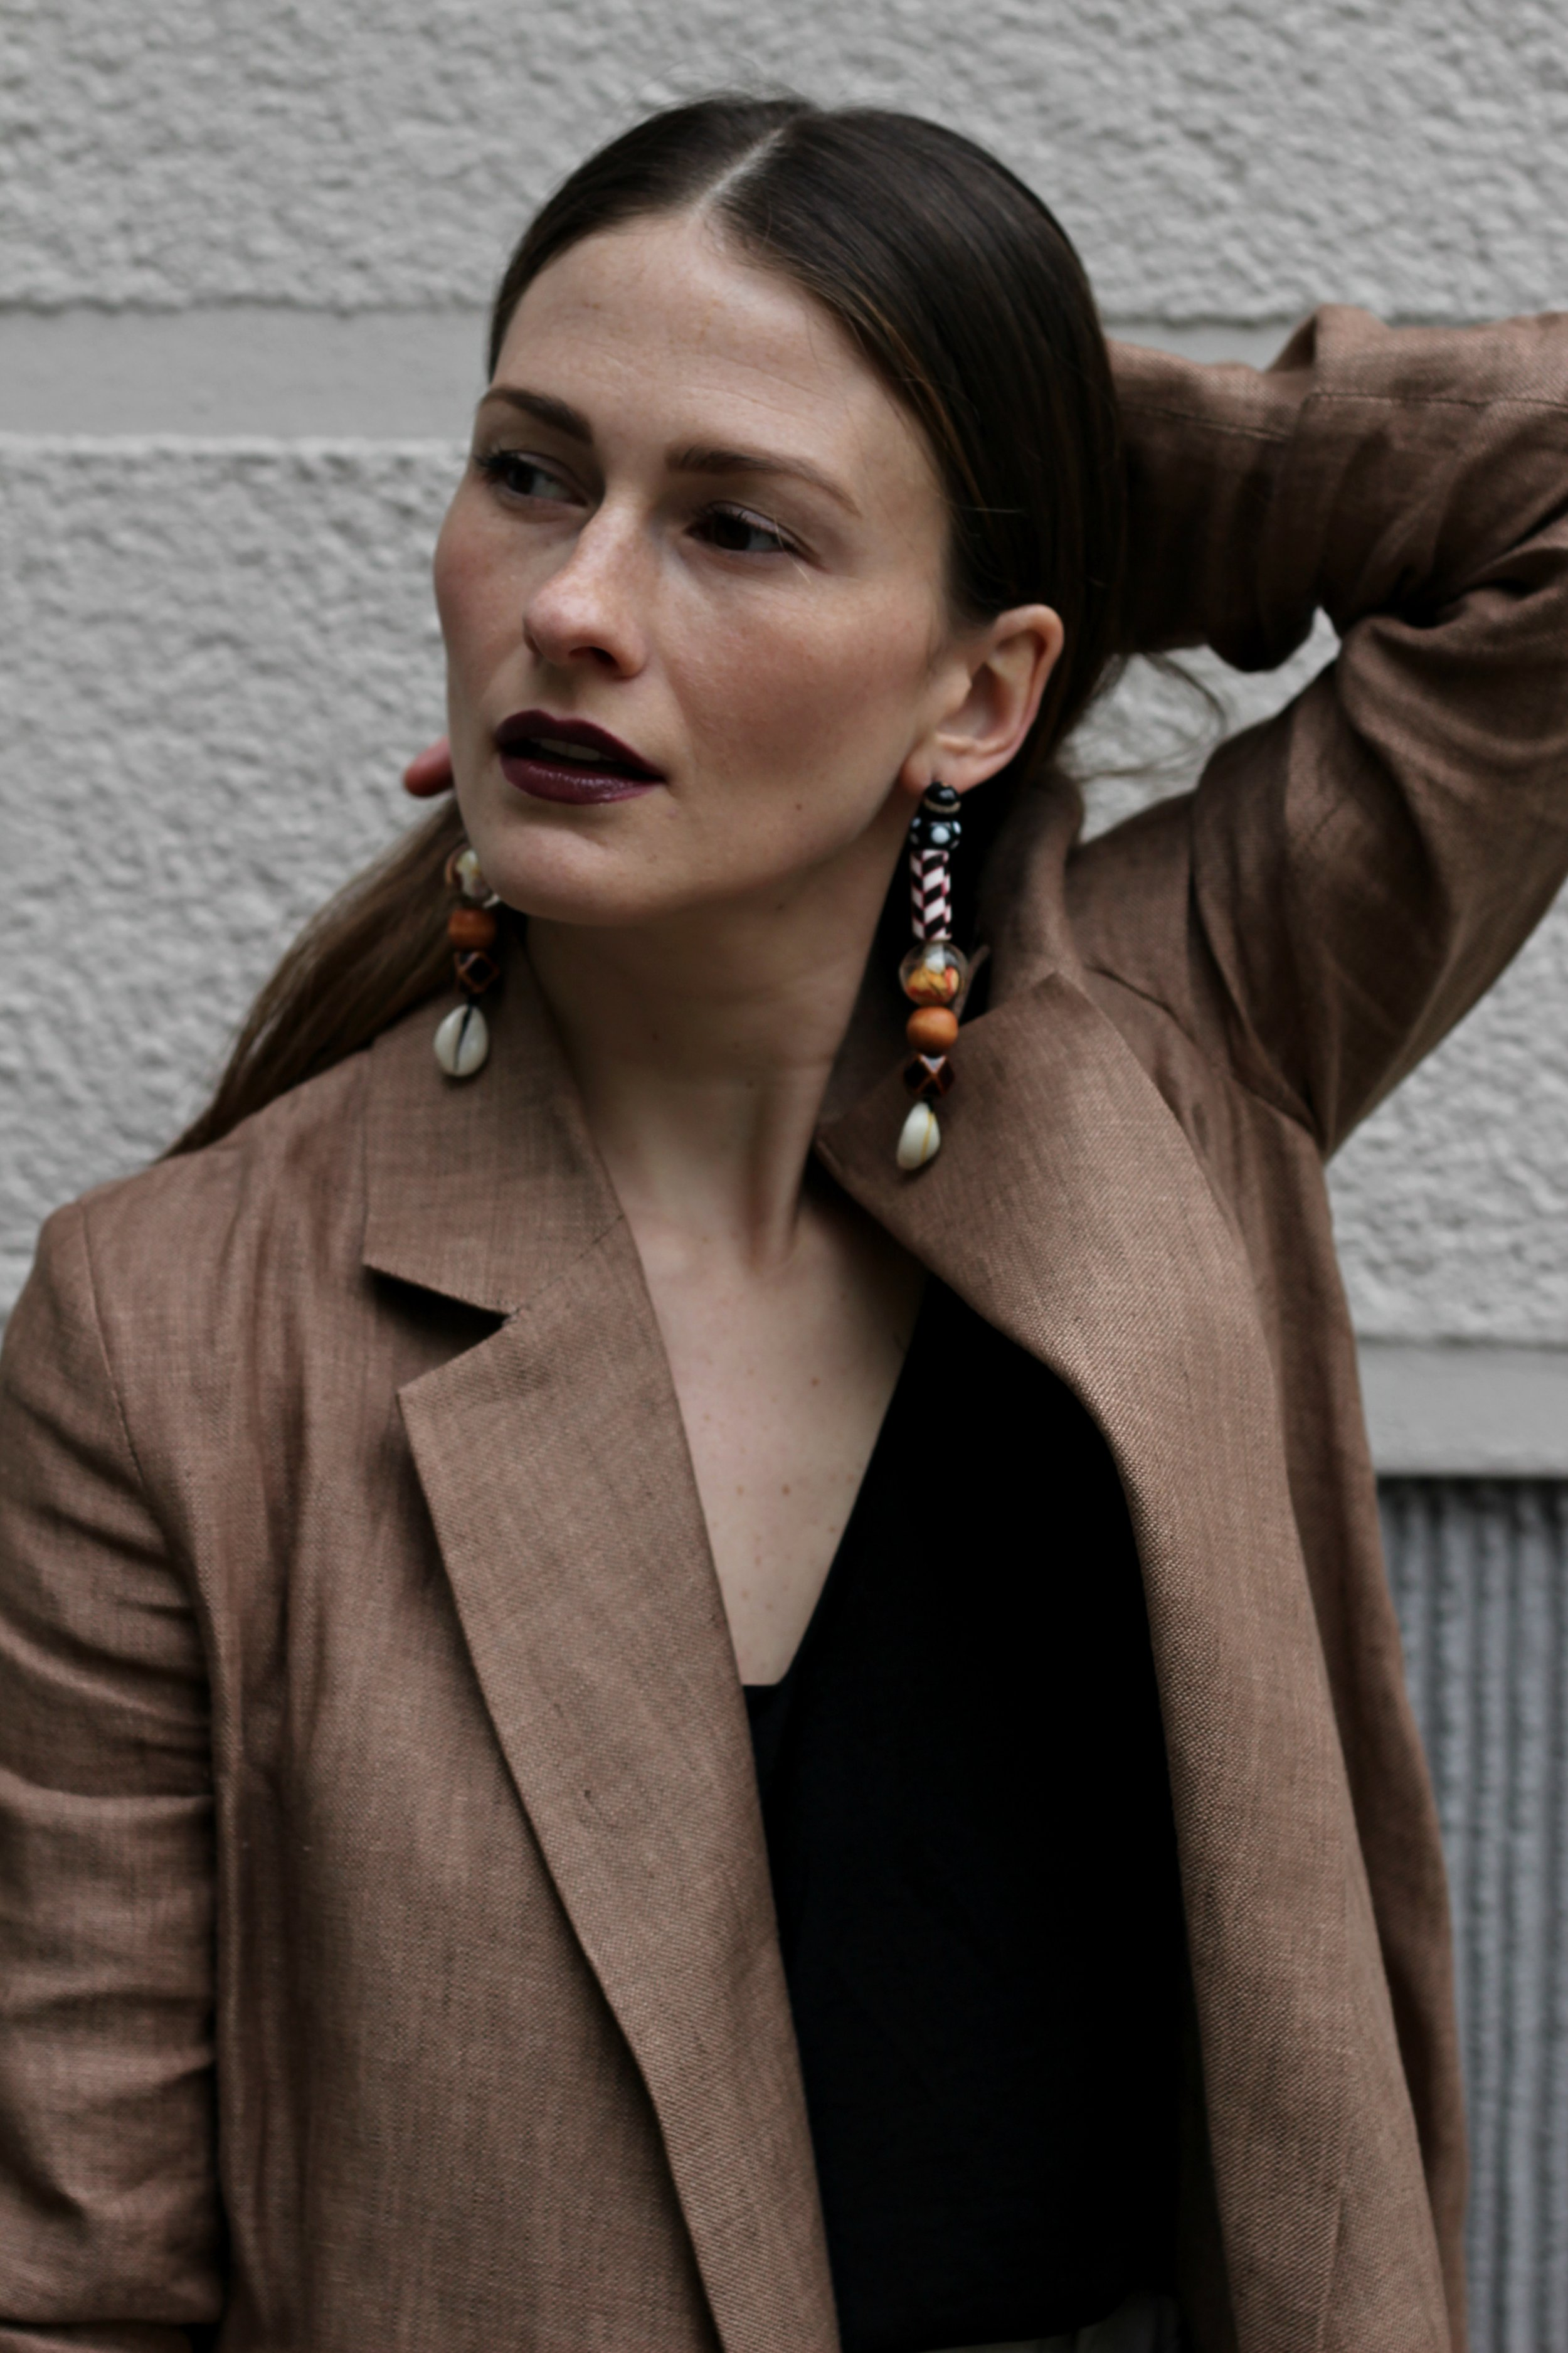 annaporter-linen-jacket-zara-fashion-blogger-business-casual-portrait